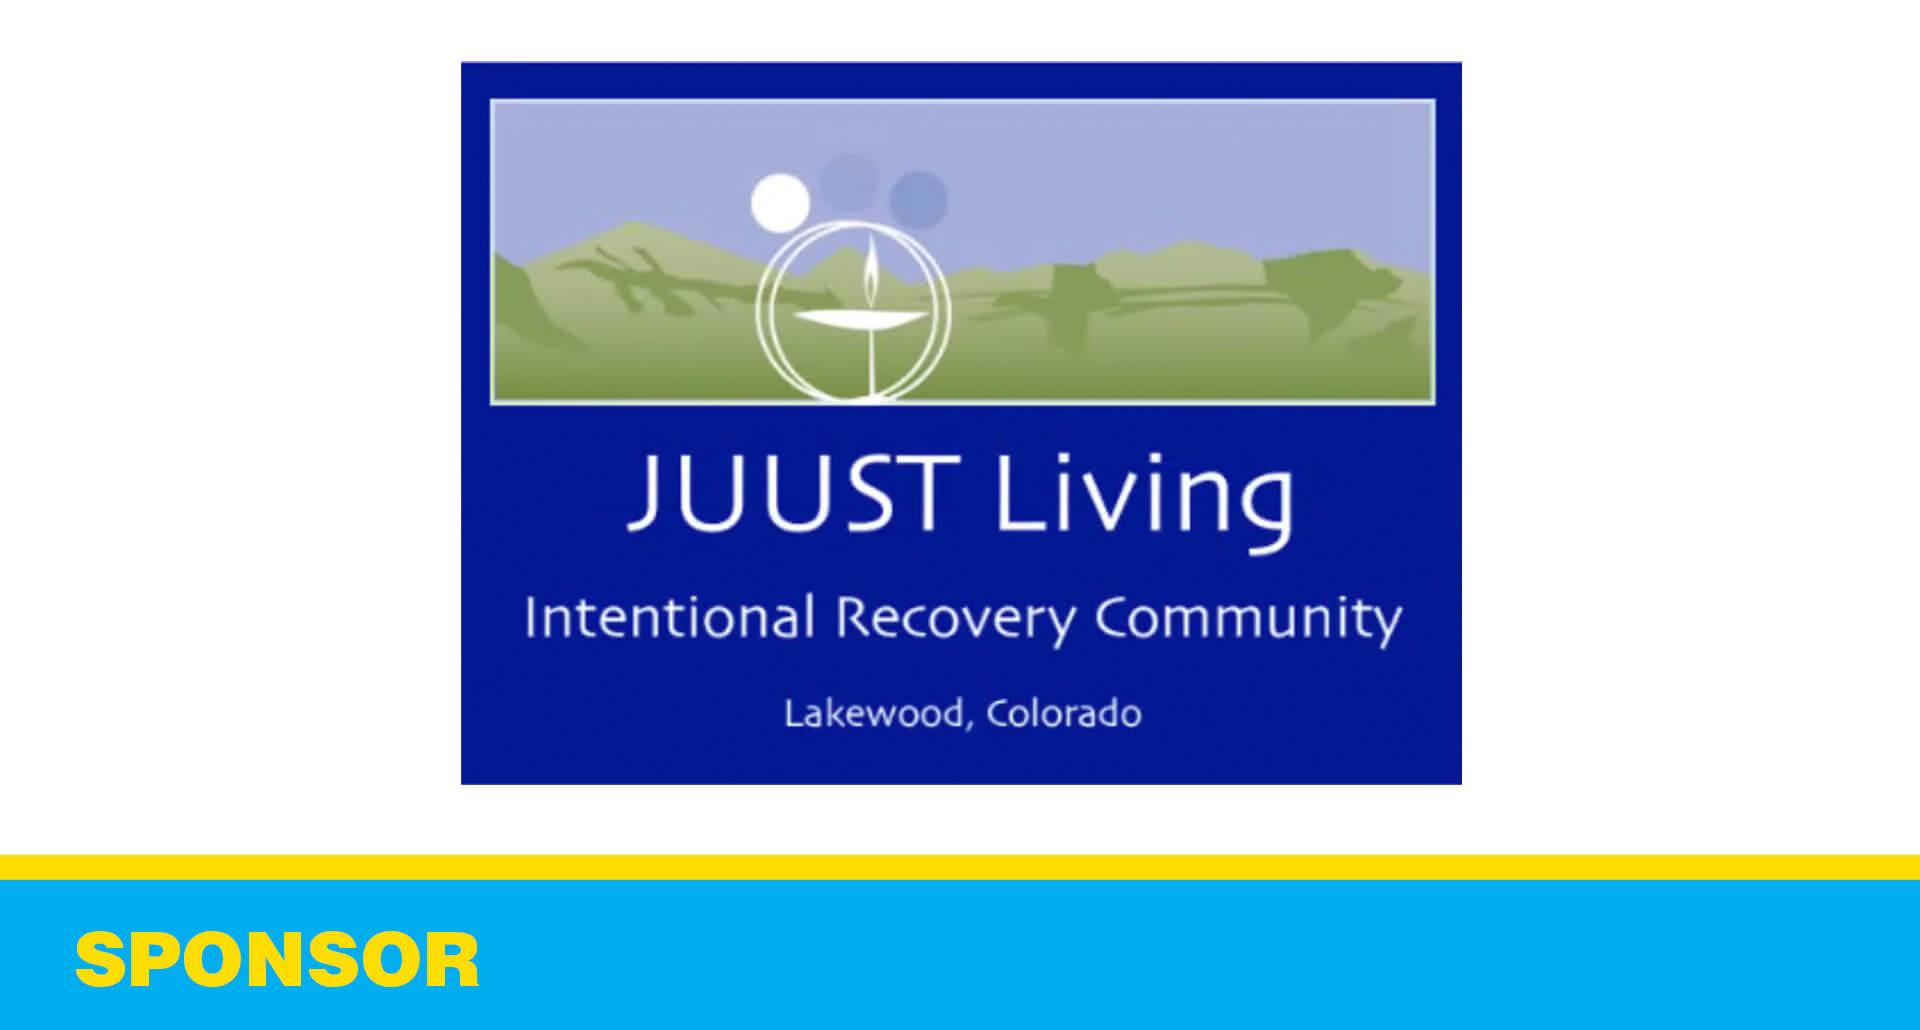 JUUST Living